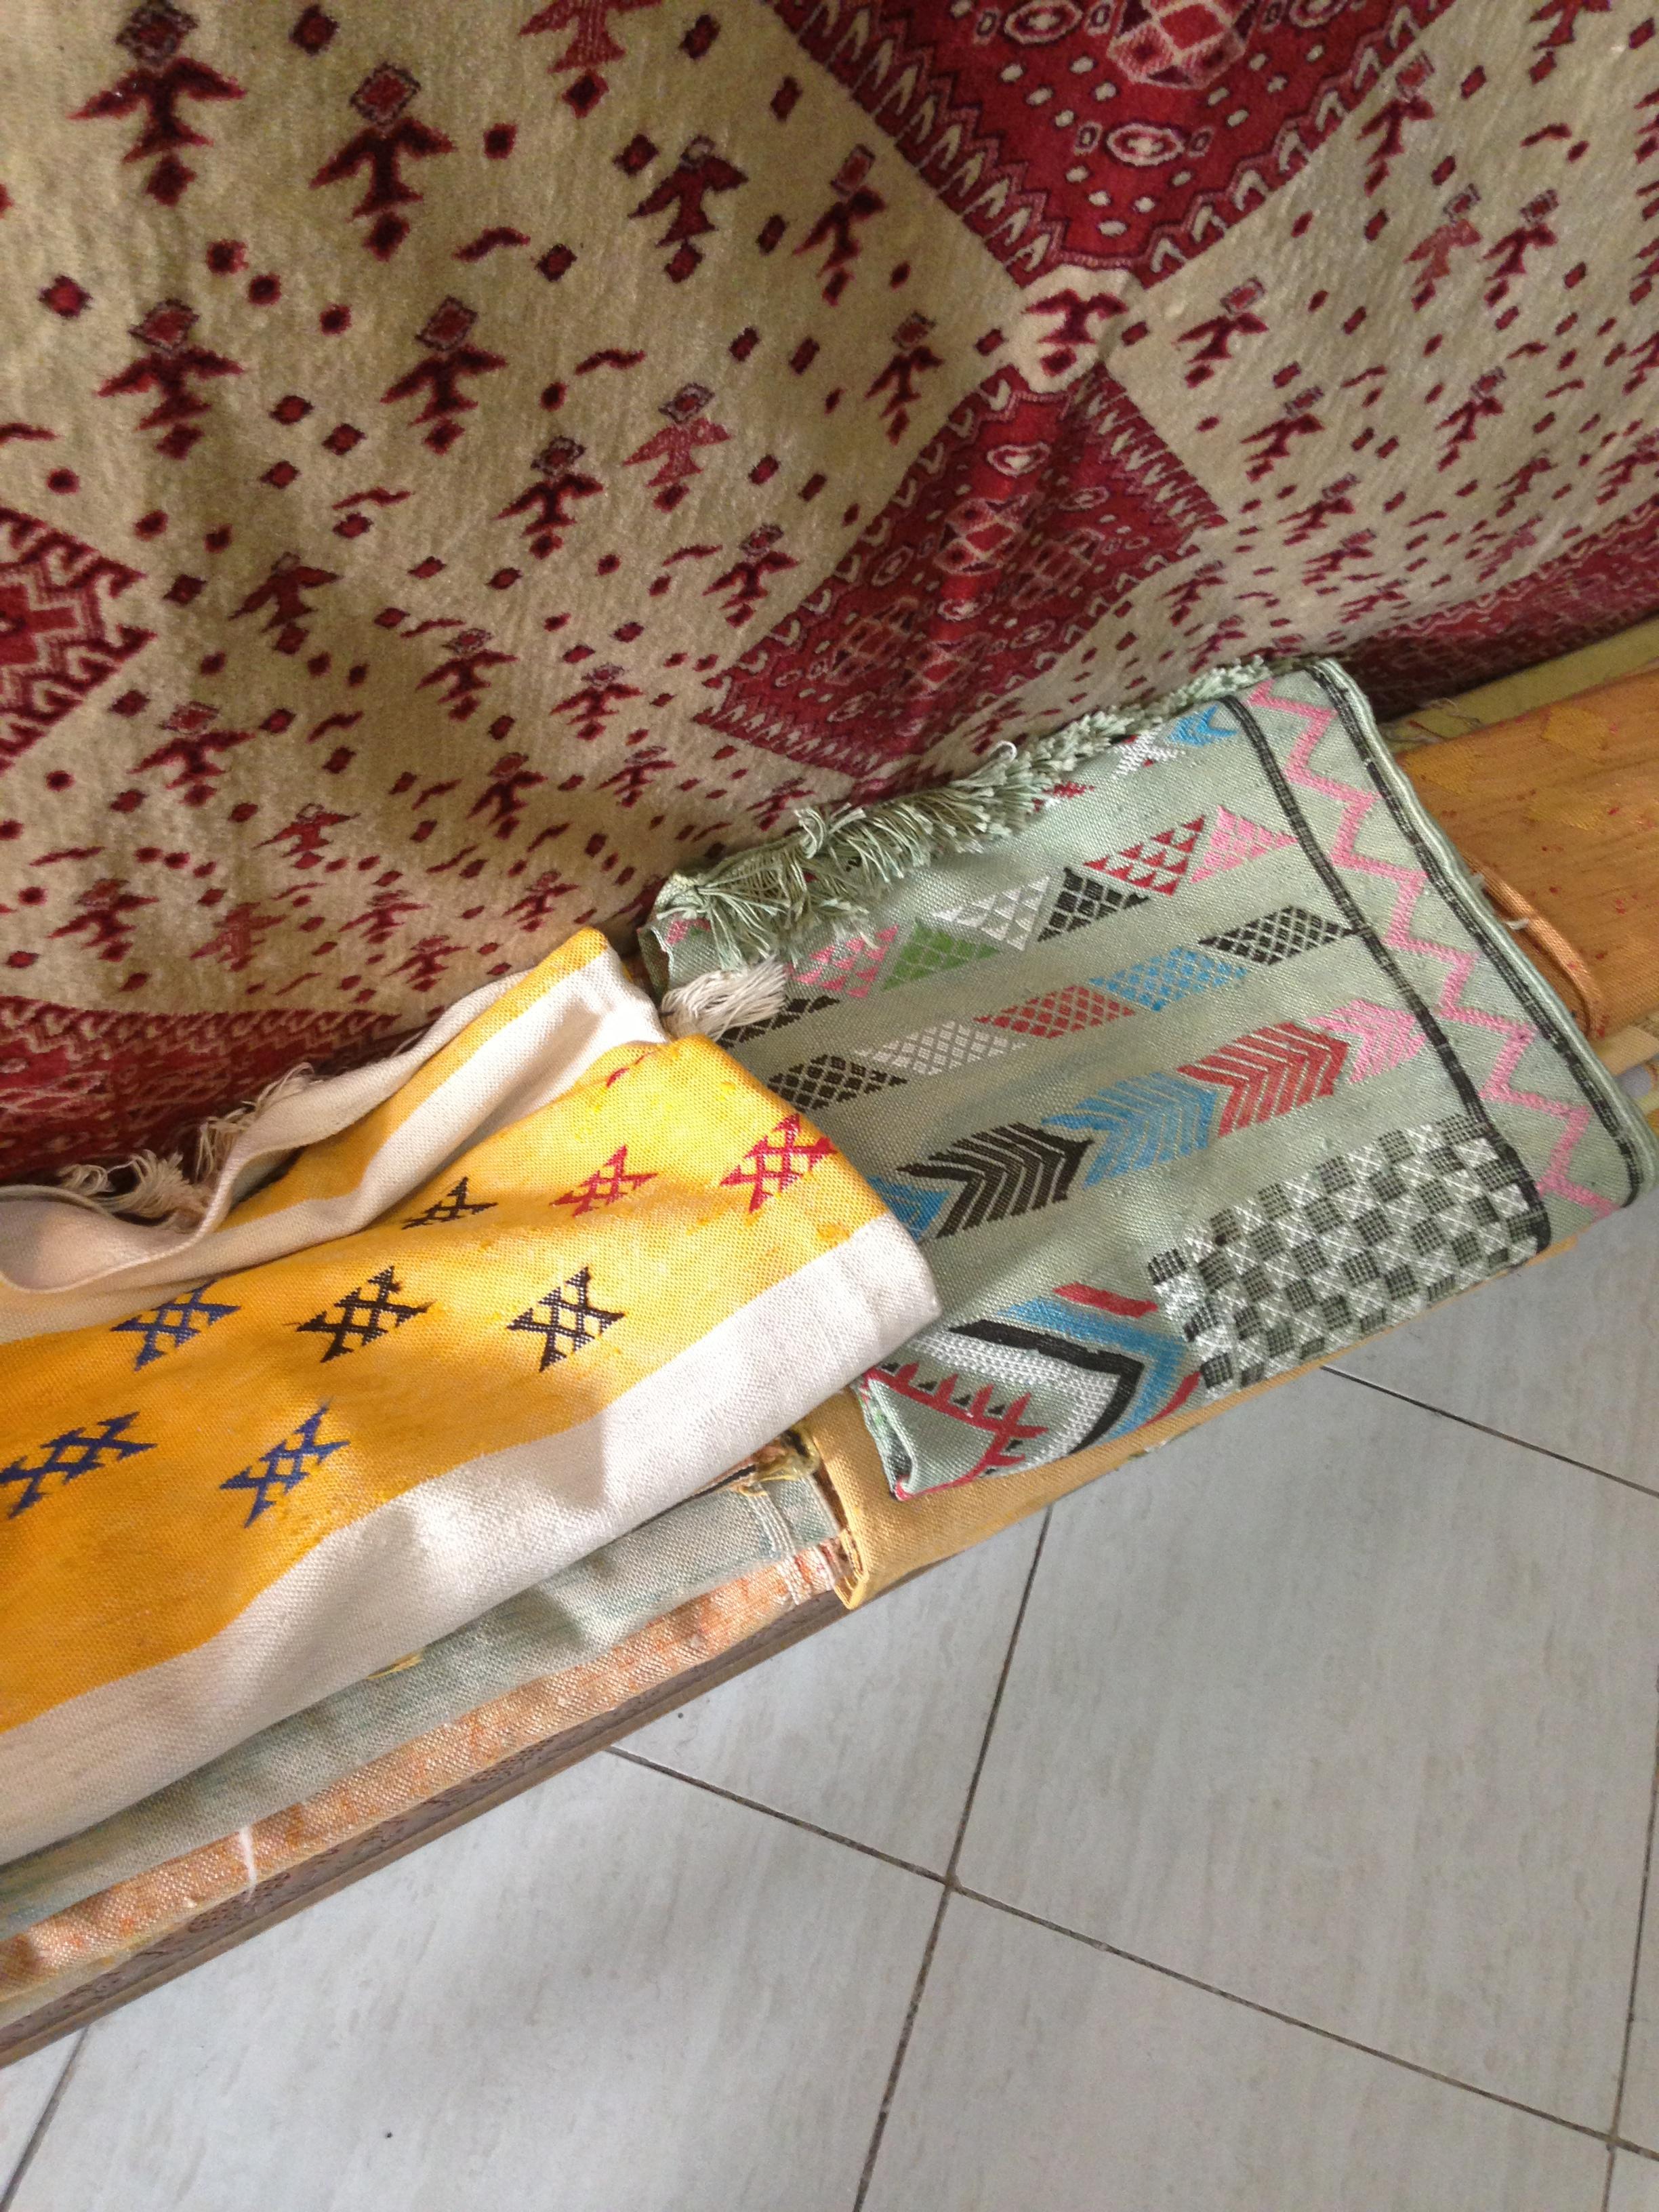 Inordinate amounts of textiles in the Medina